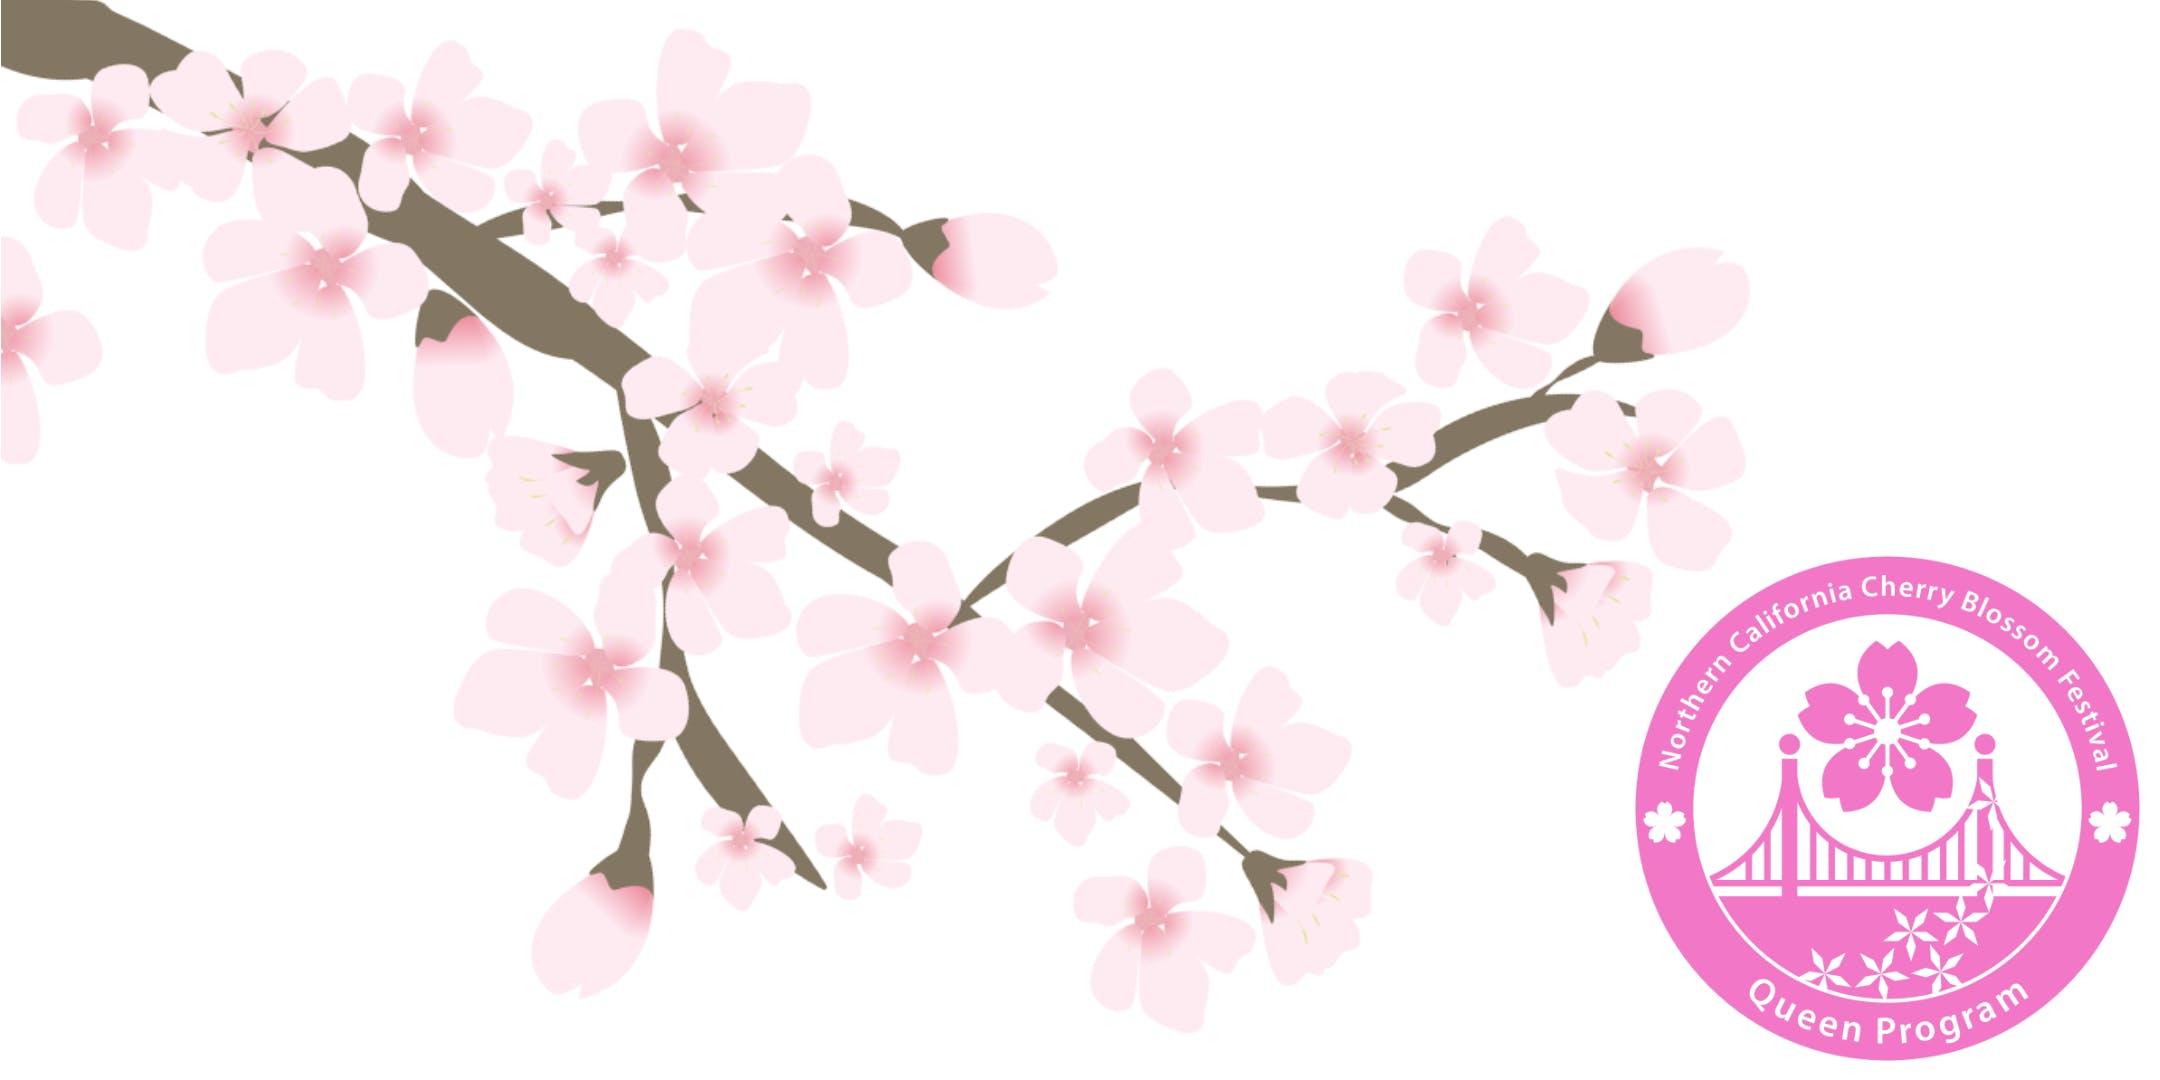 52nd Annual Northern California Cherry Blosso